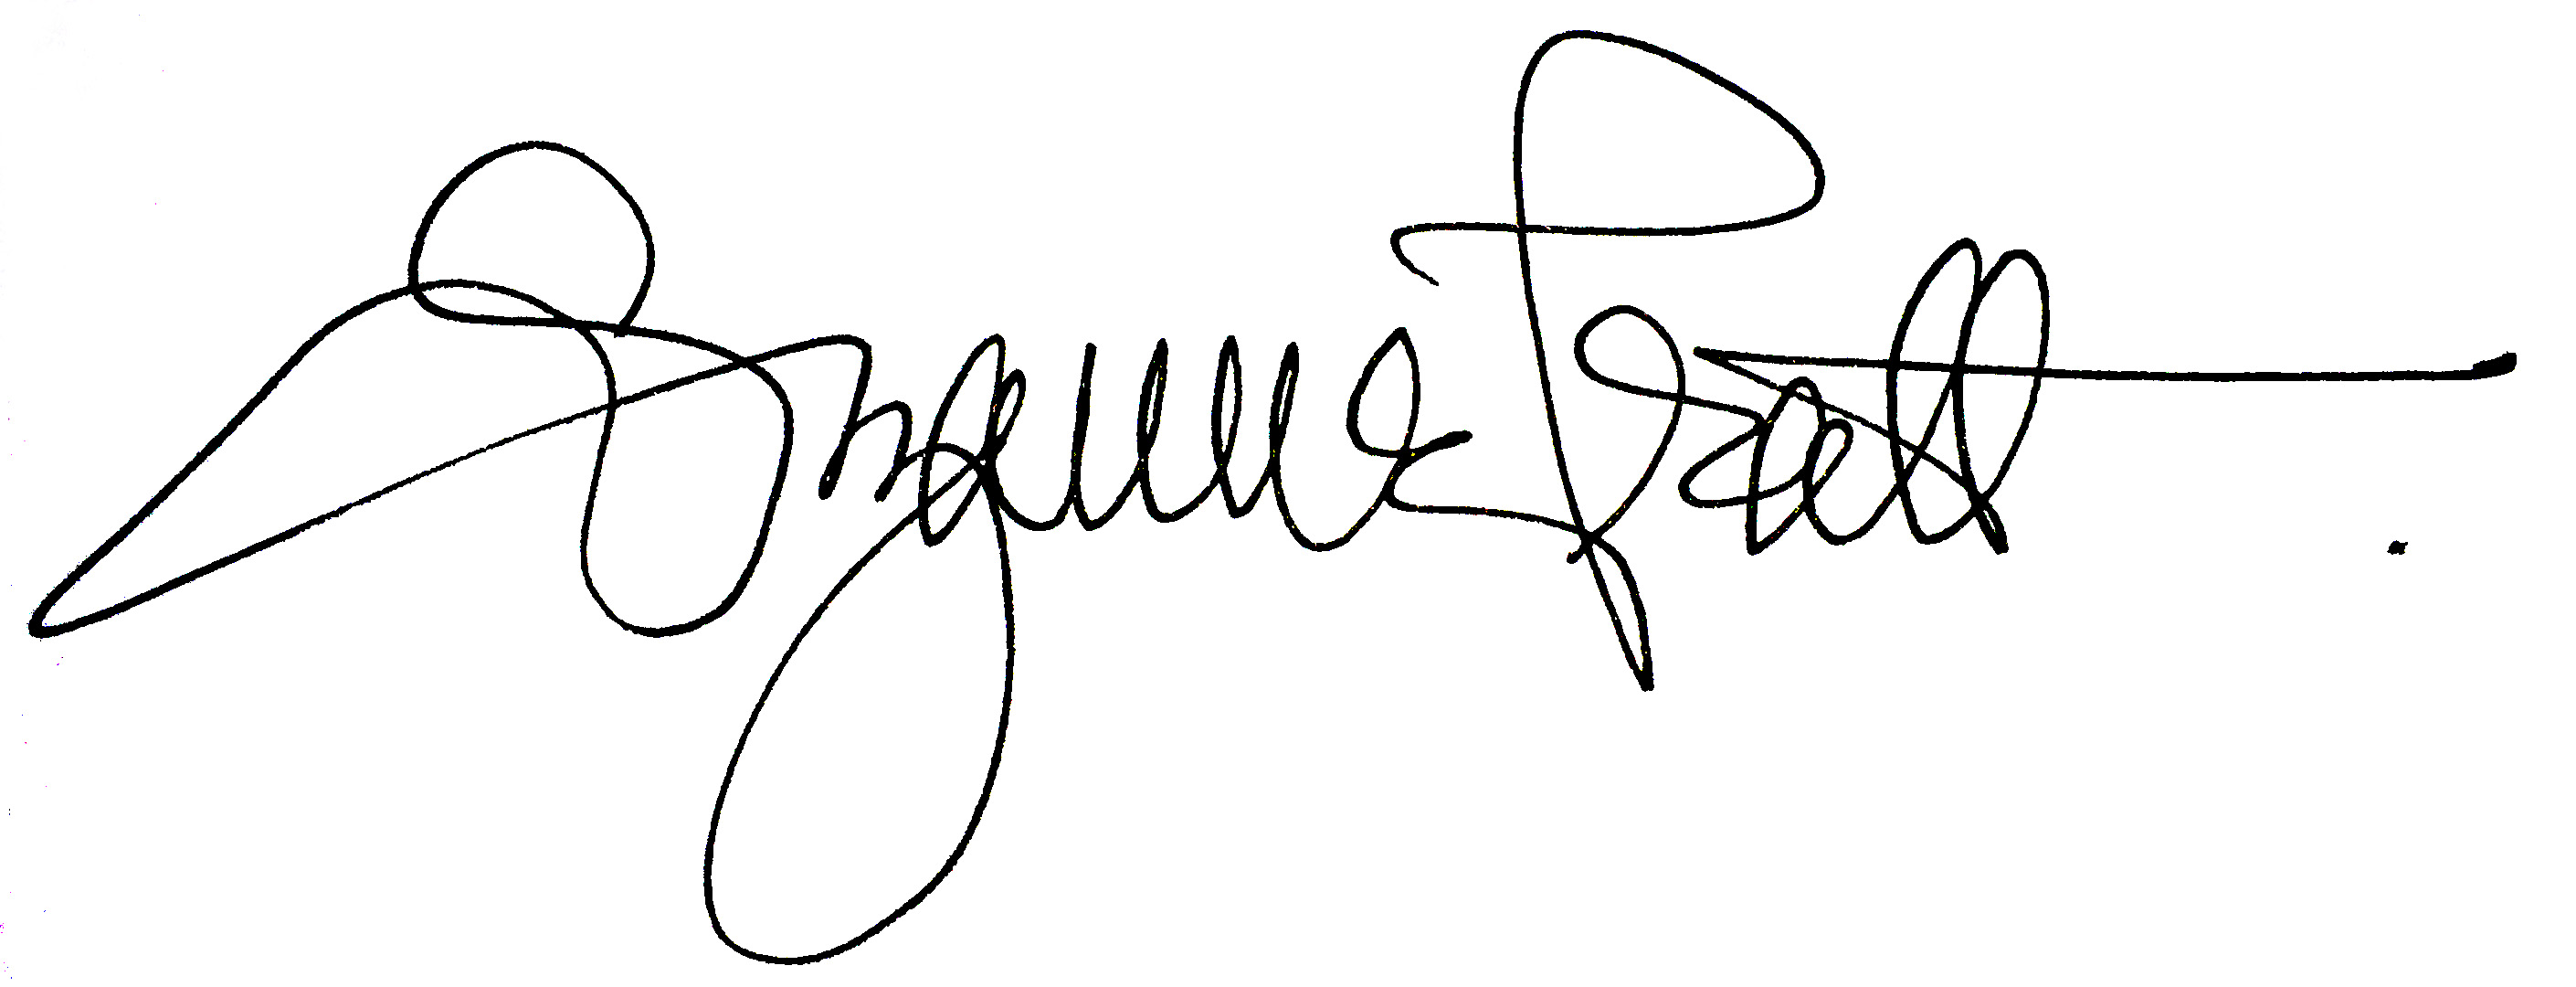 Suzanne Pratt Signature